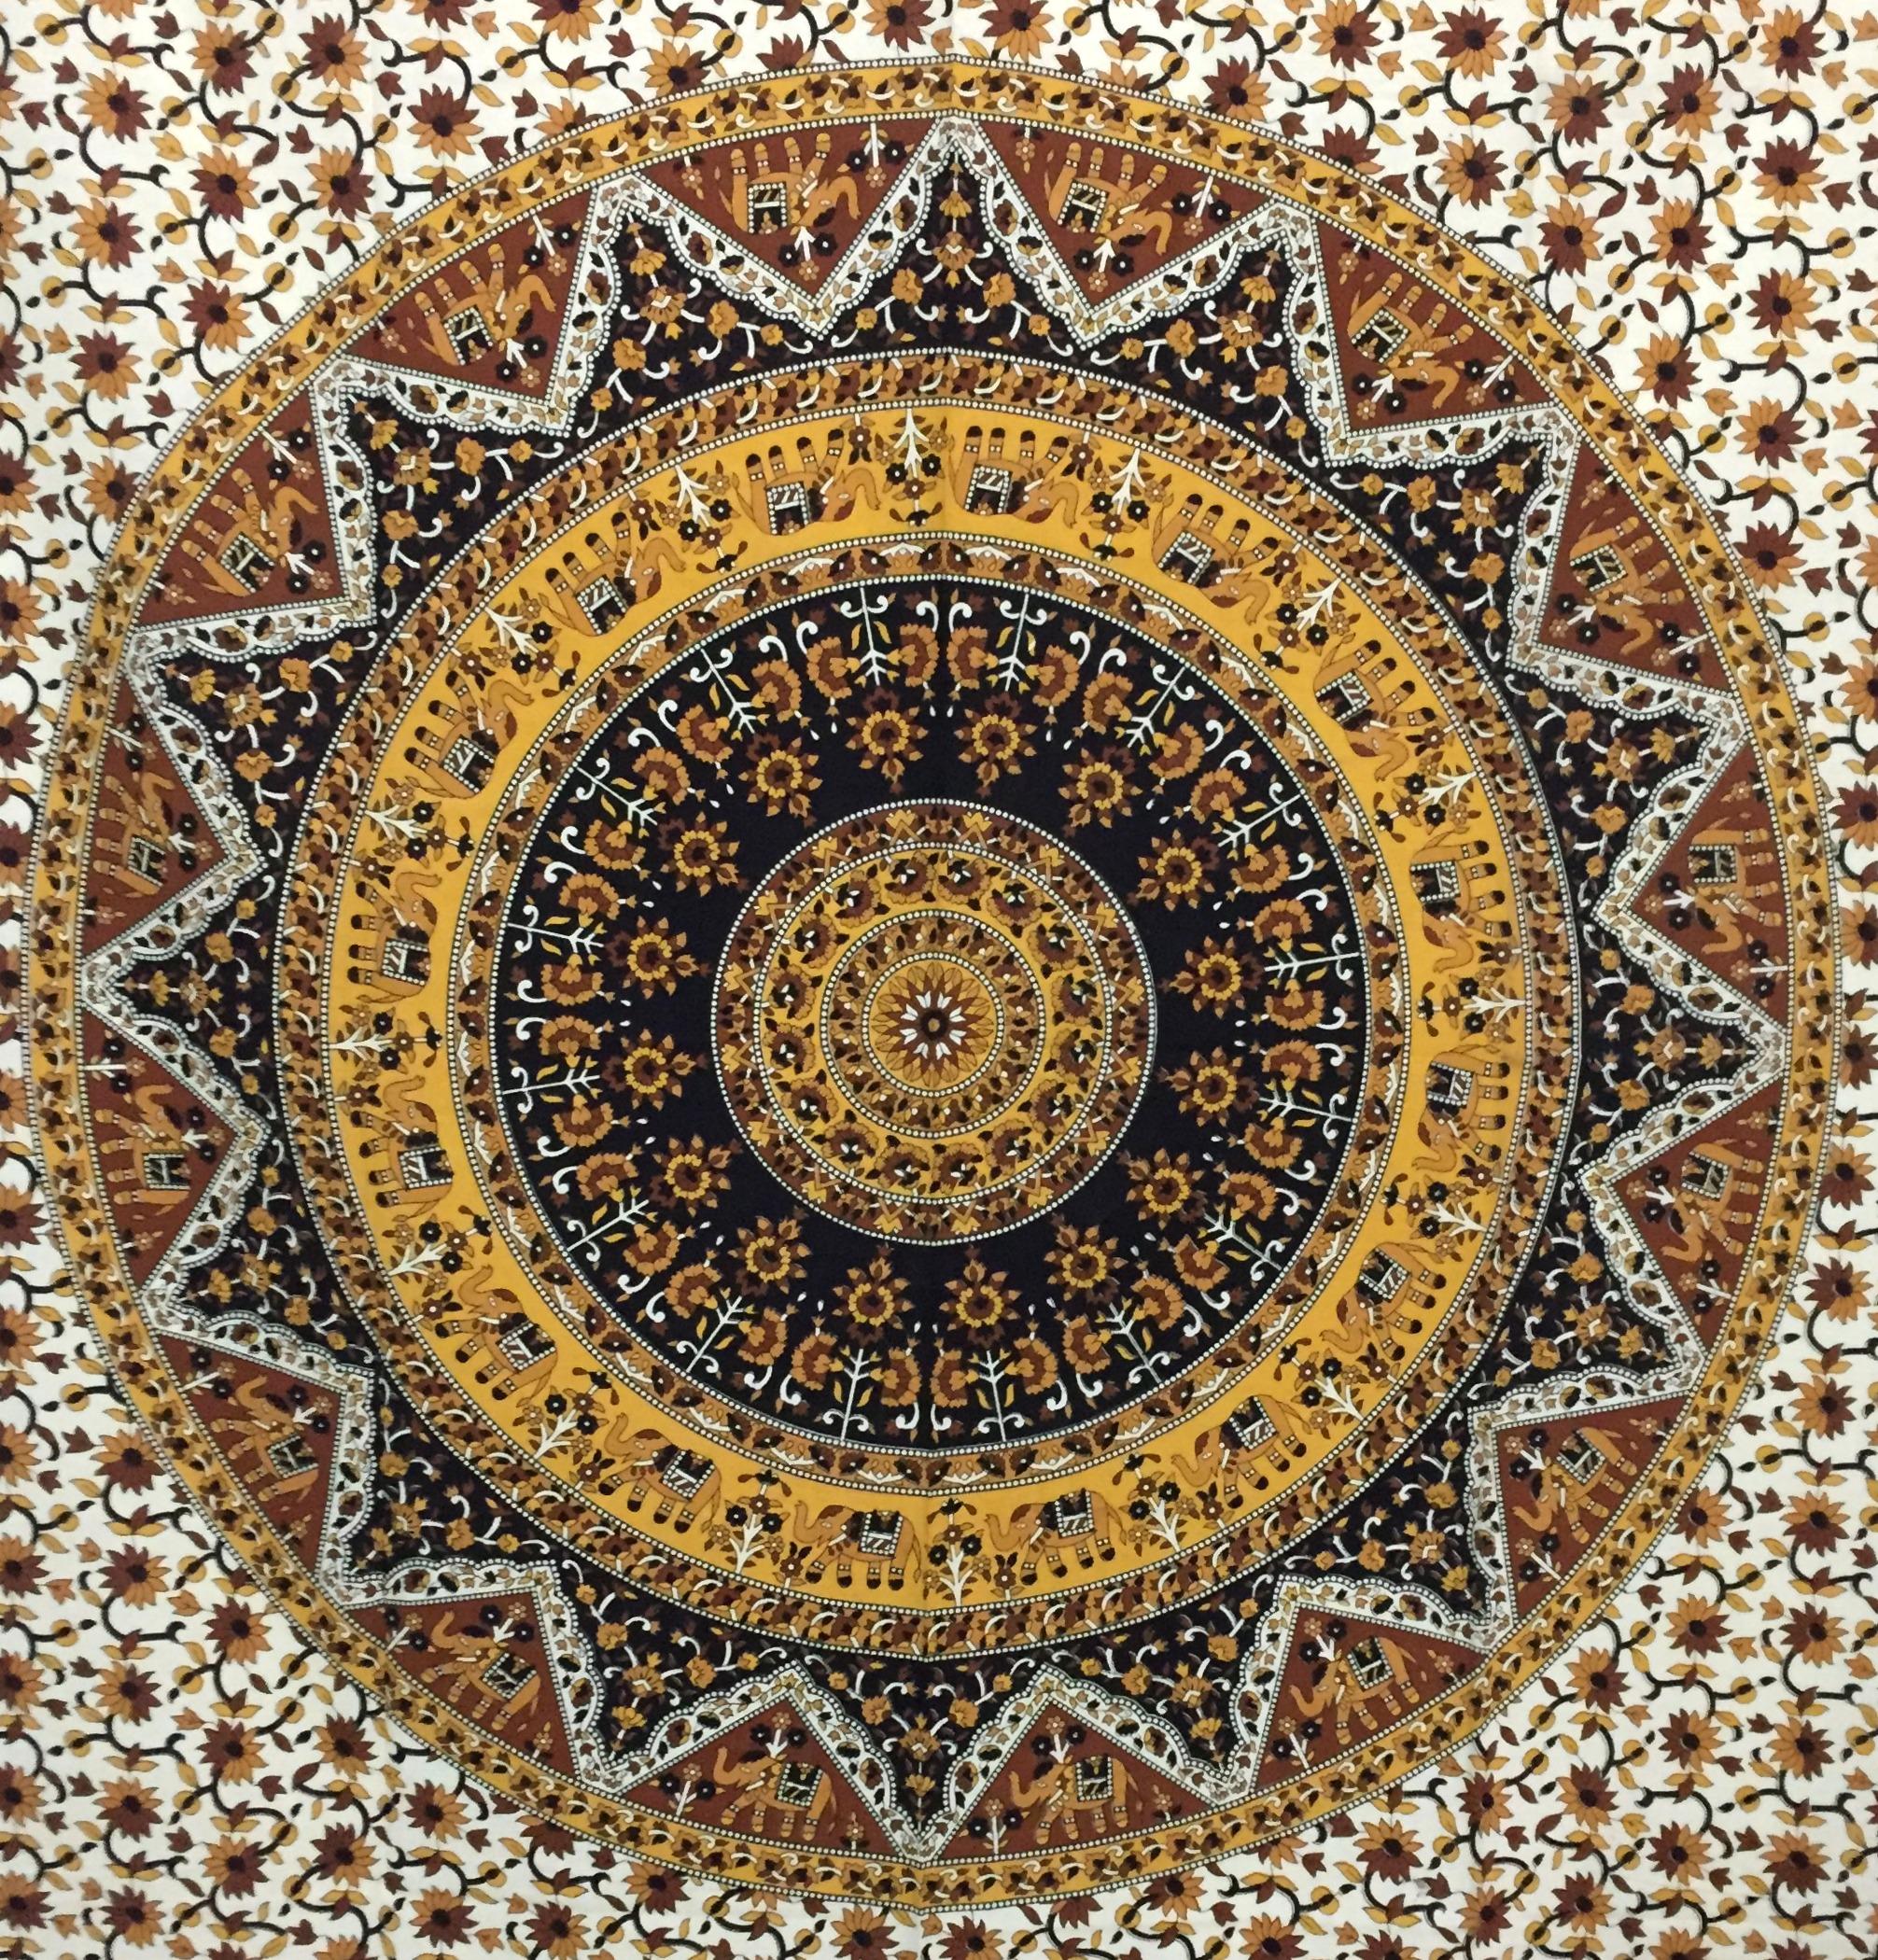 dfcb682bda Elephant mandala Flower Cotton Twin Tapestry Yellow - INDIAN CONSIGNERS -  2776912